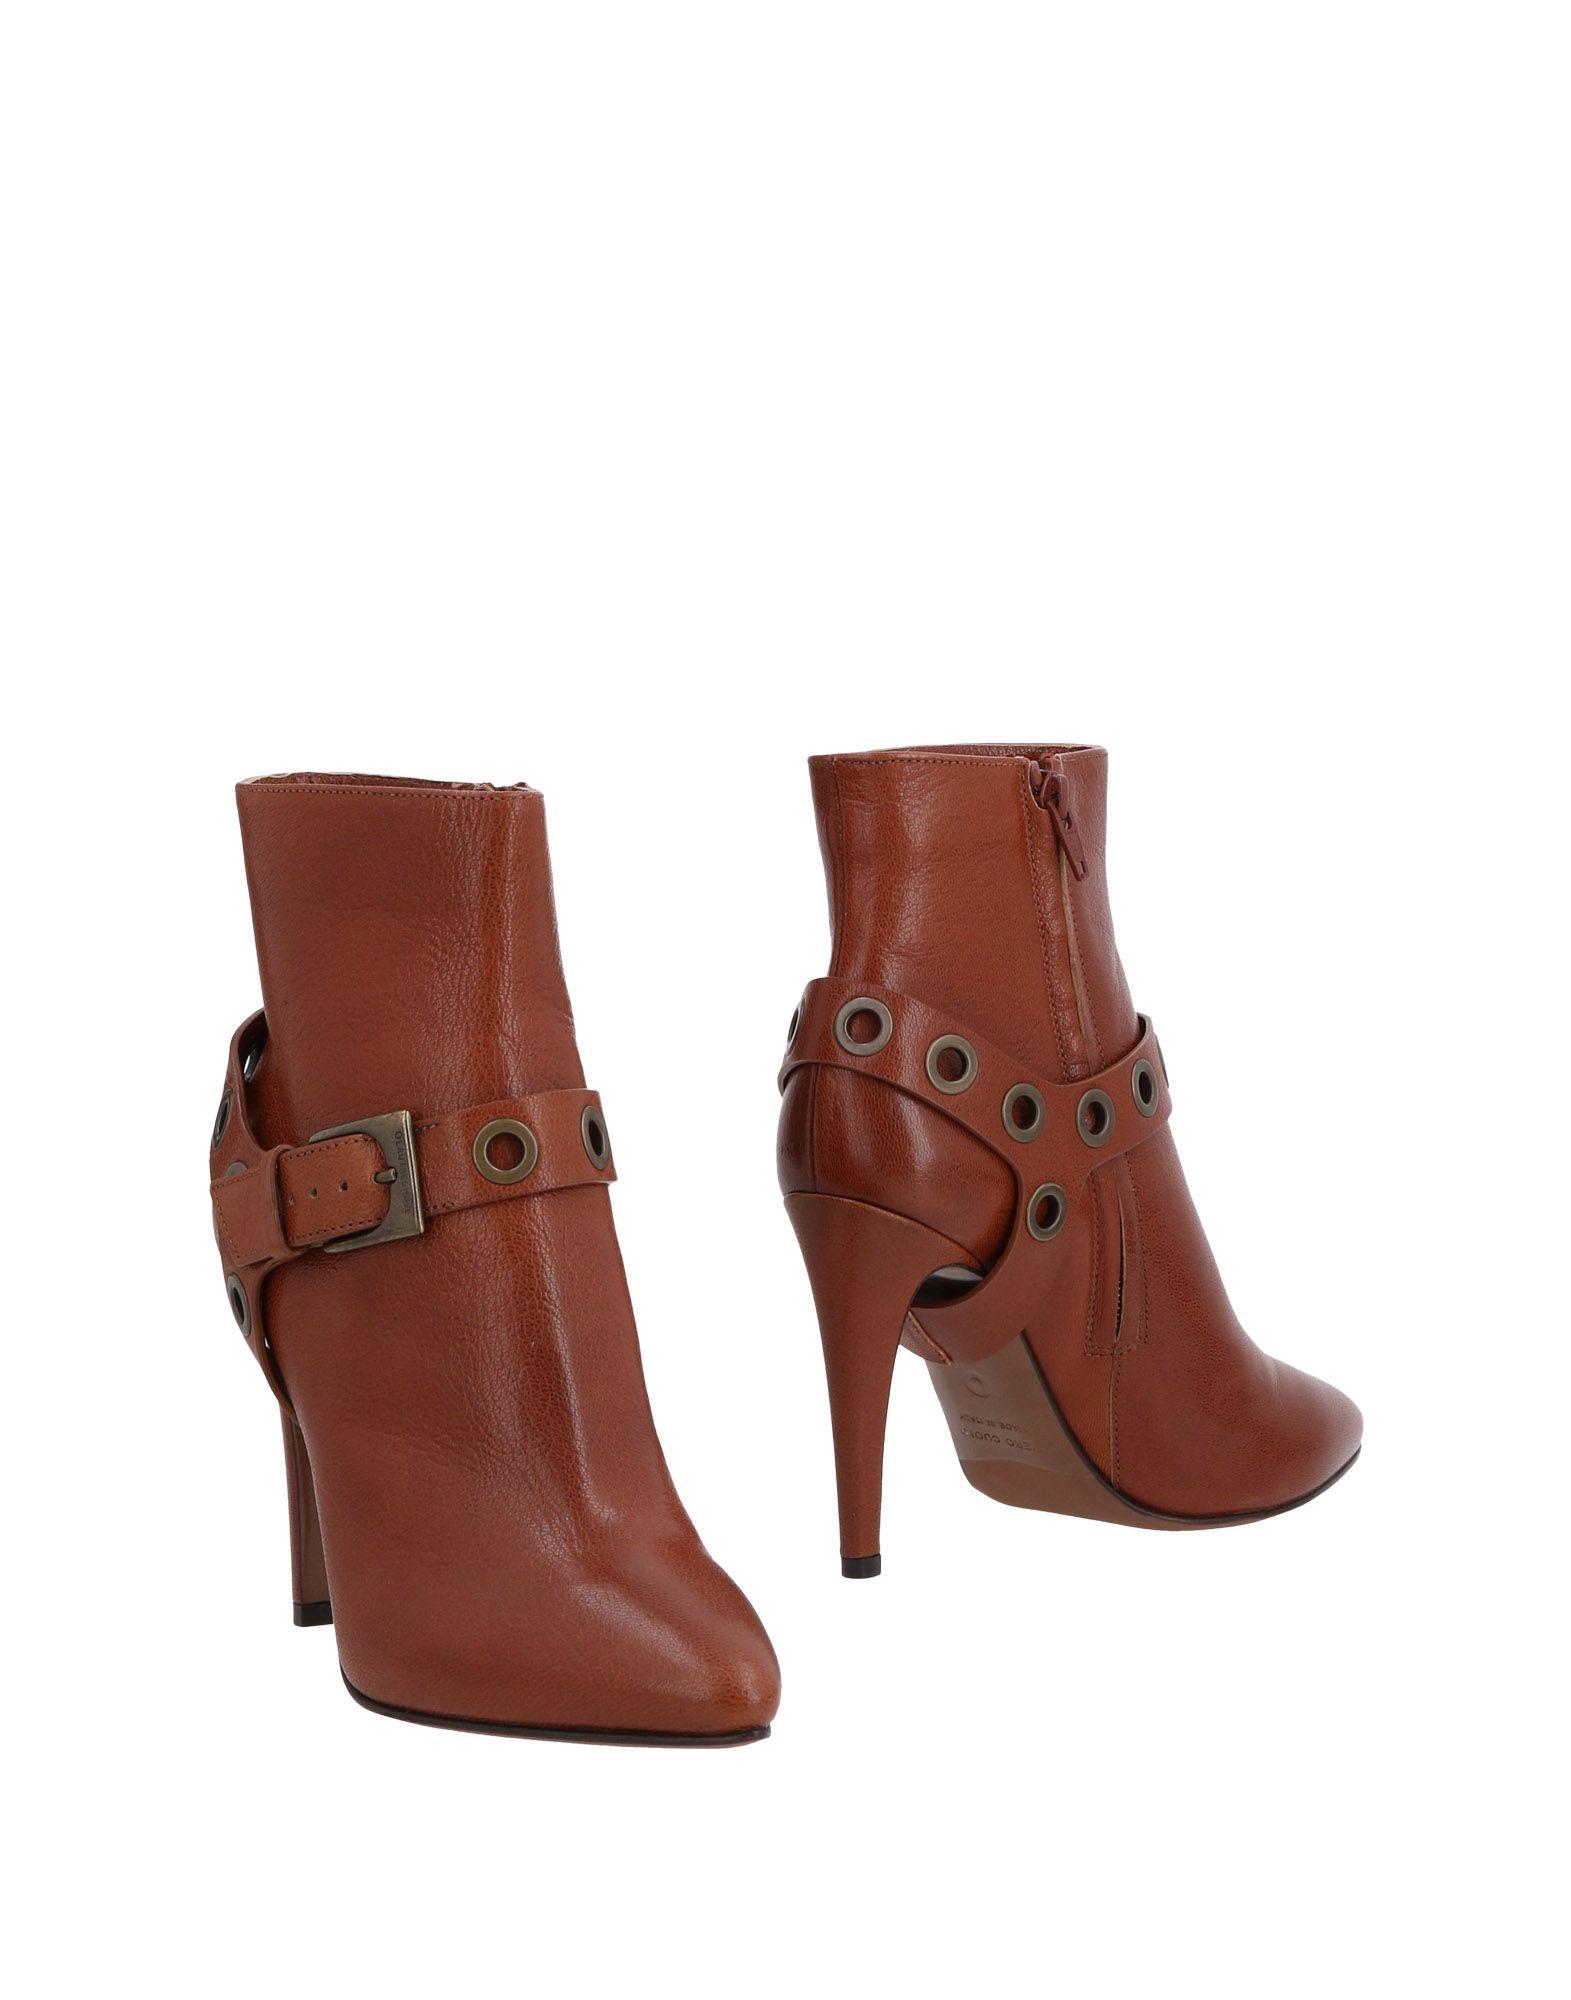 Rabatt Schuhe L' Autre Chose Stiefelette Damen  11485003UF